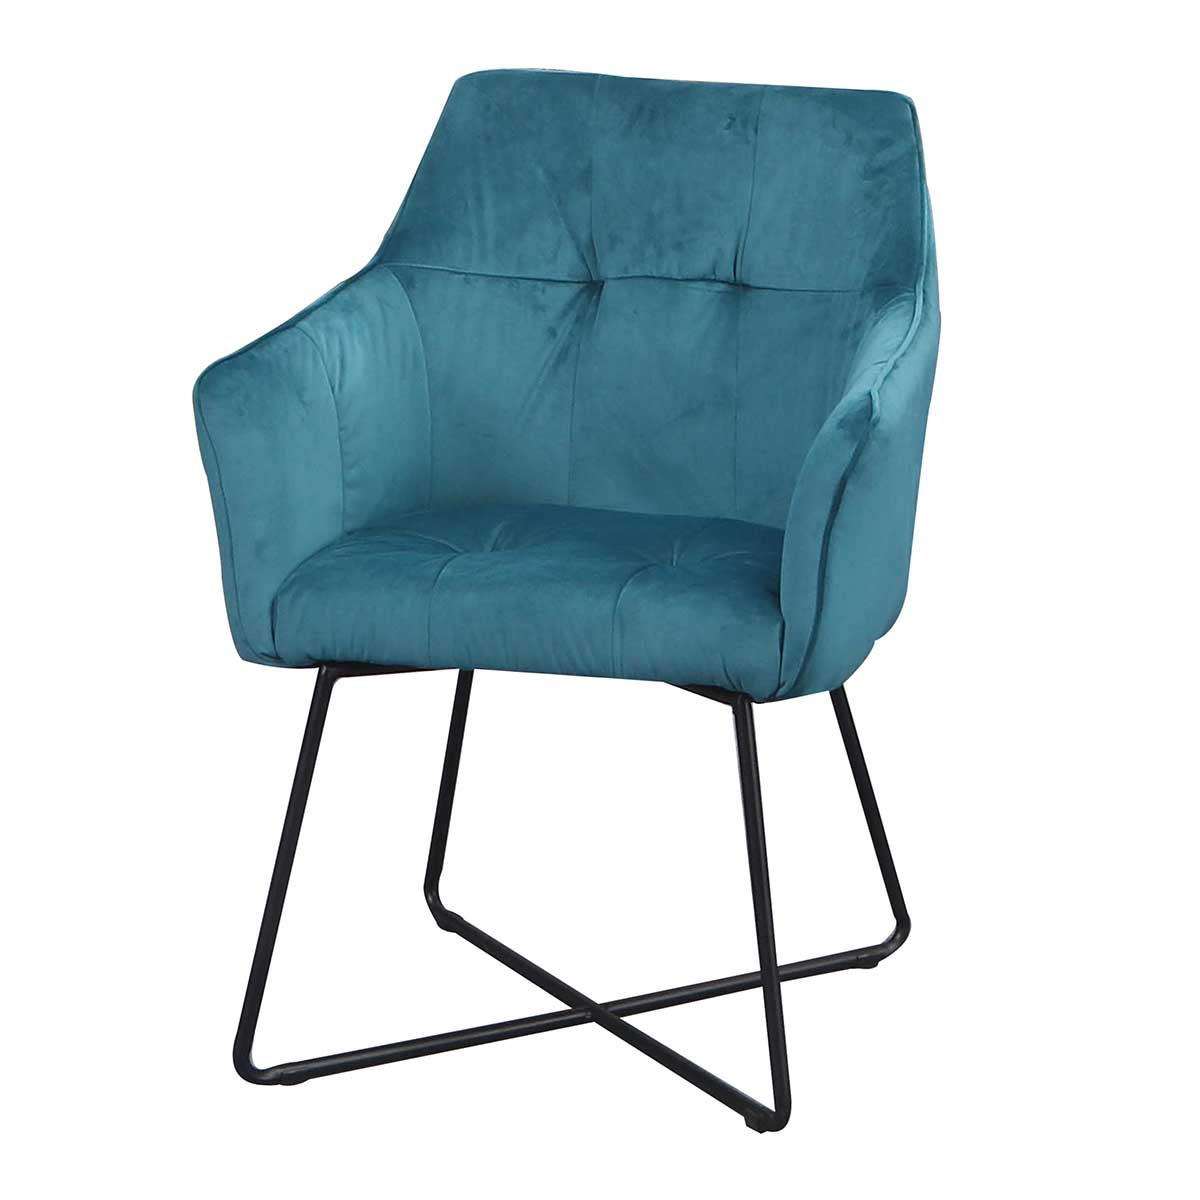 Stílusos szék Giuliana türkizkék